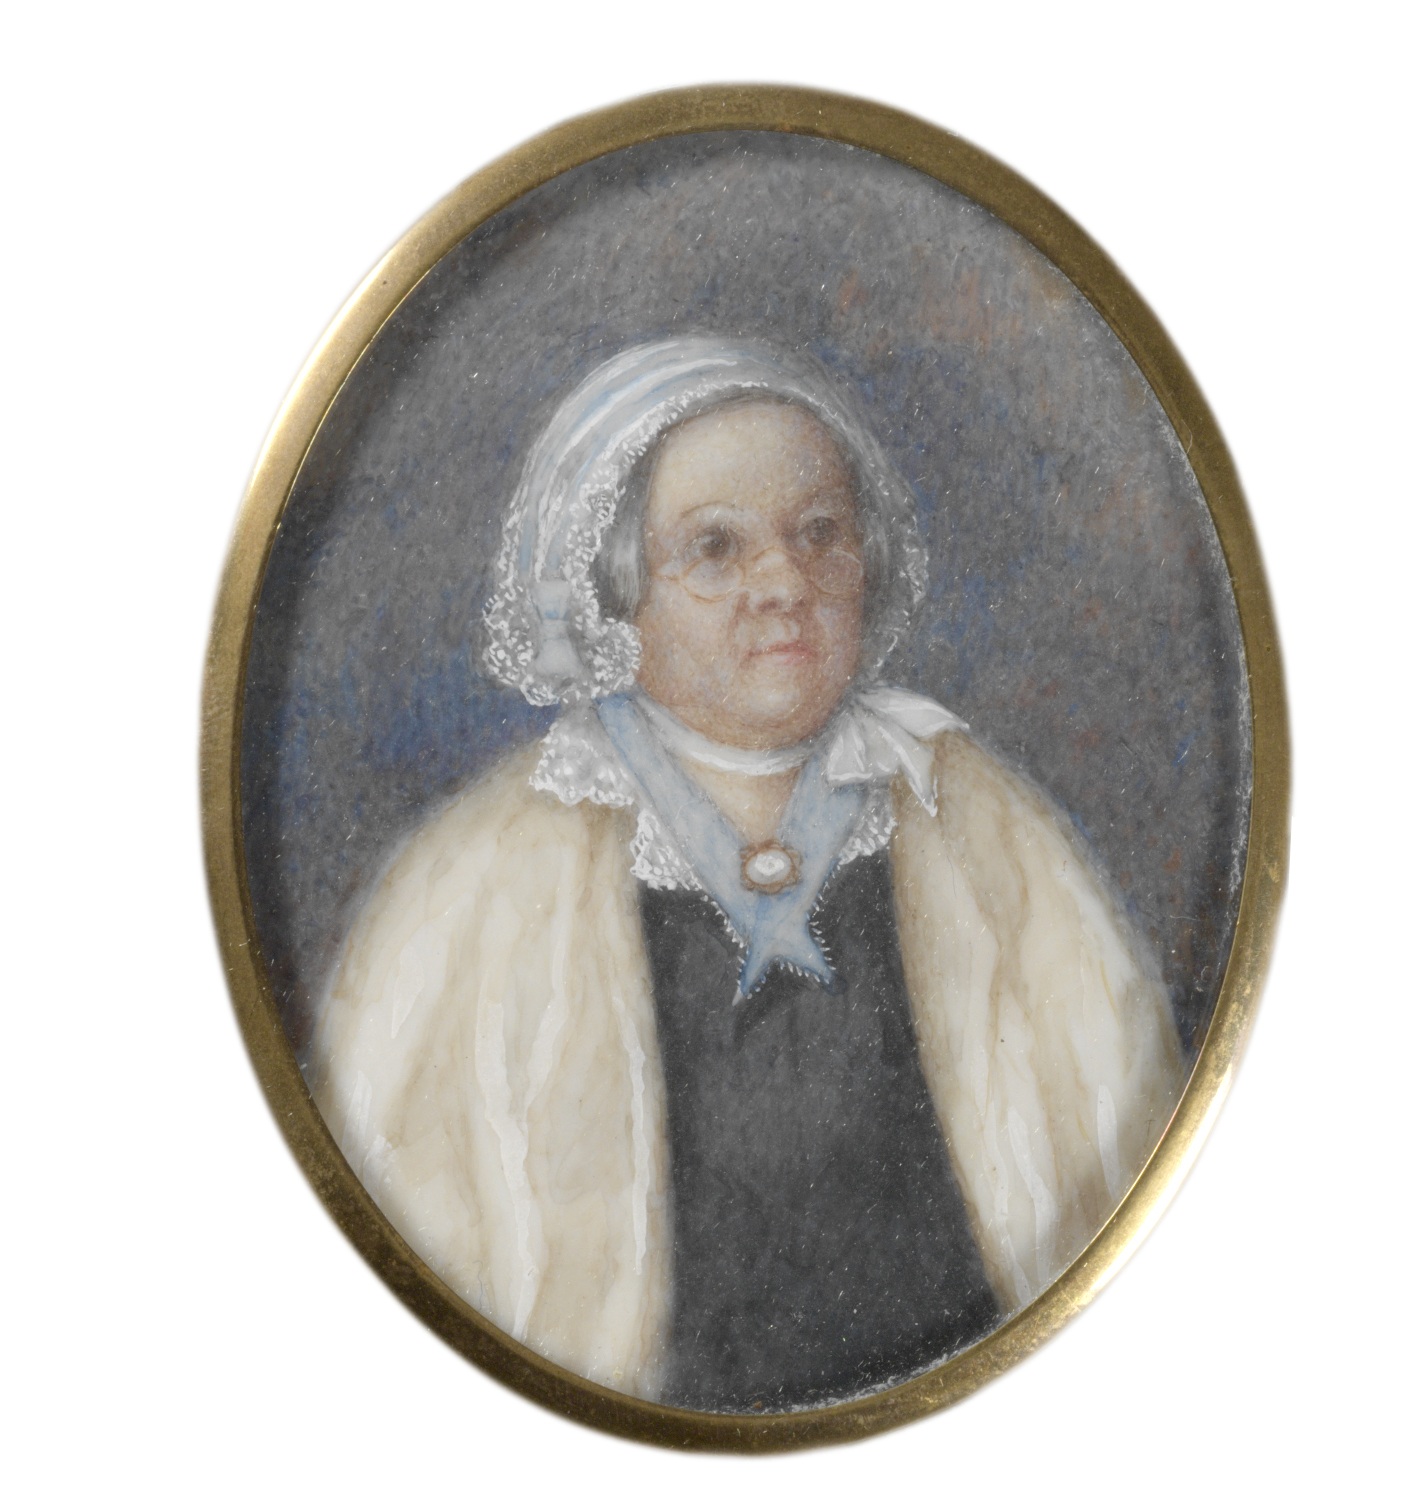 Mary Reibey - Wikipedia